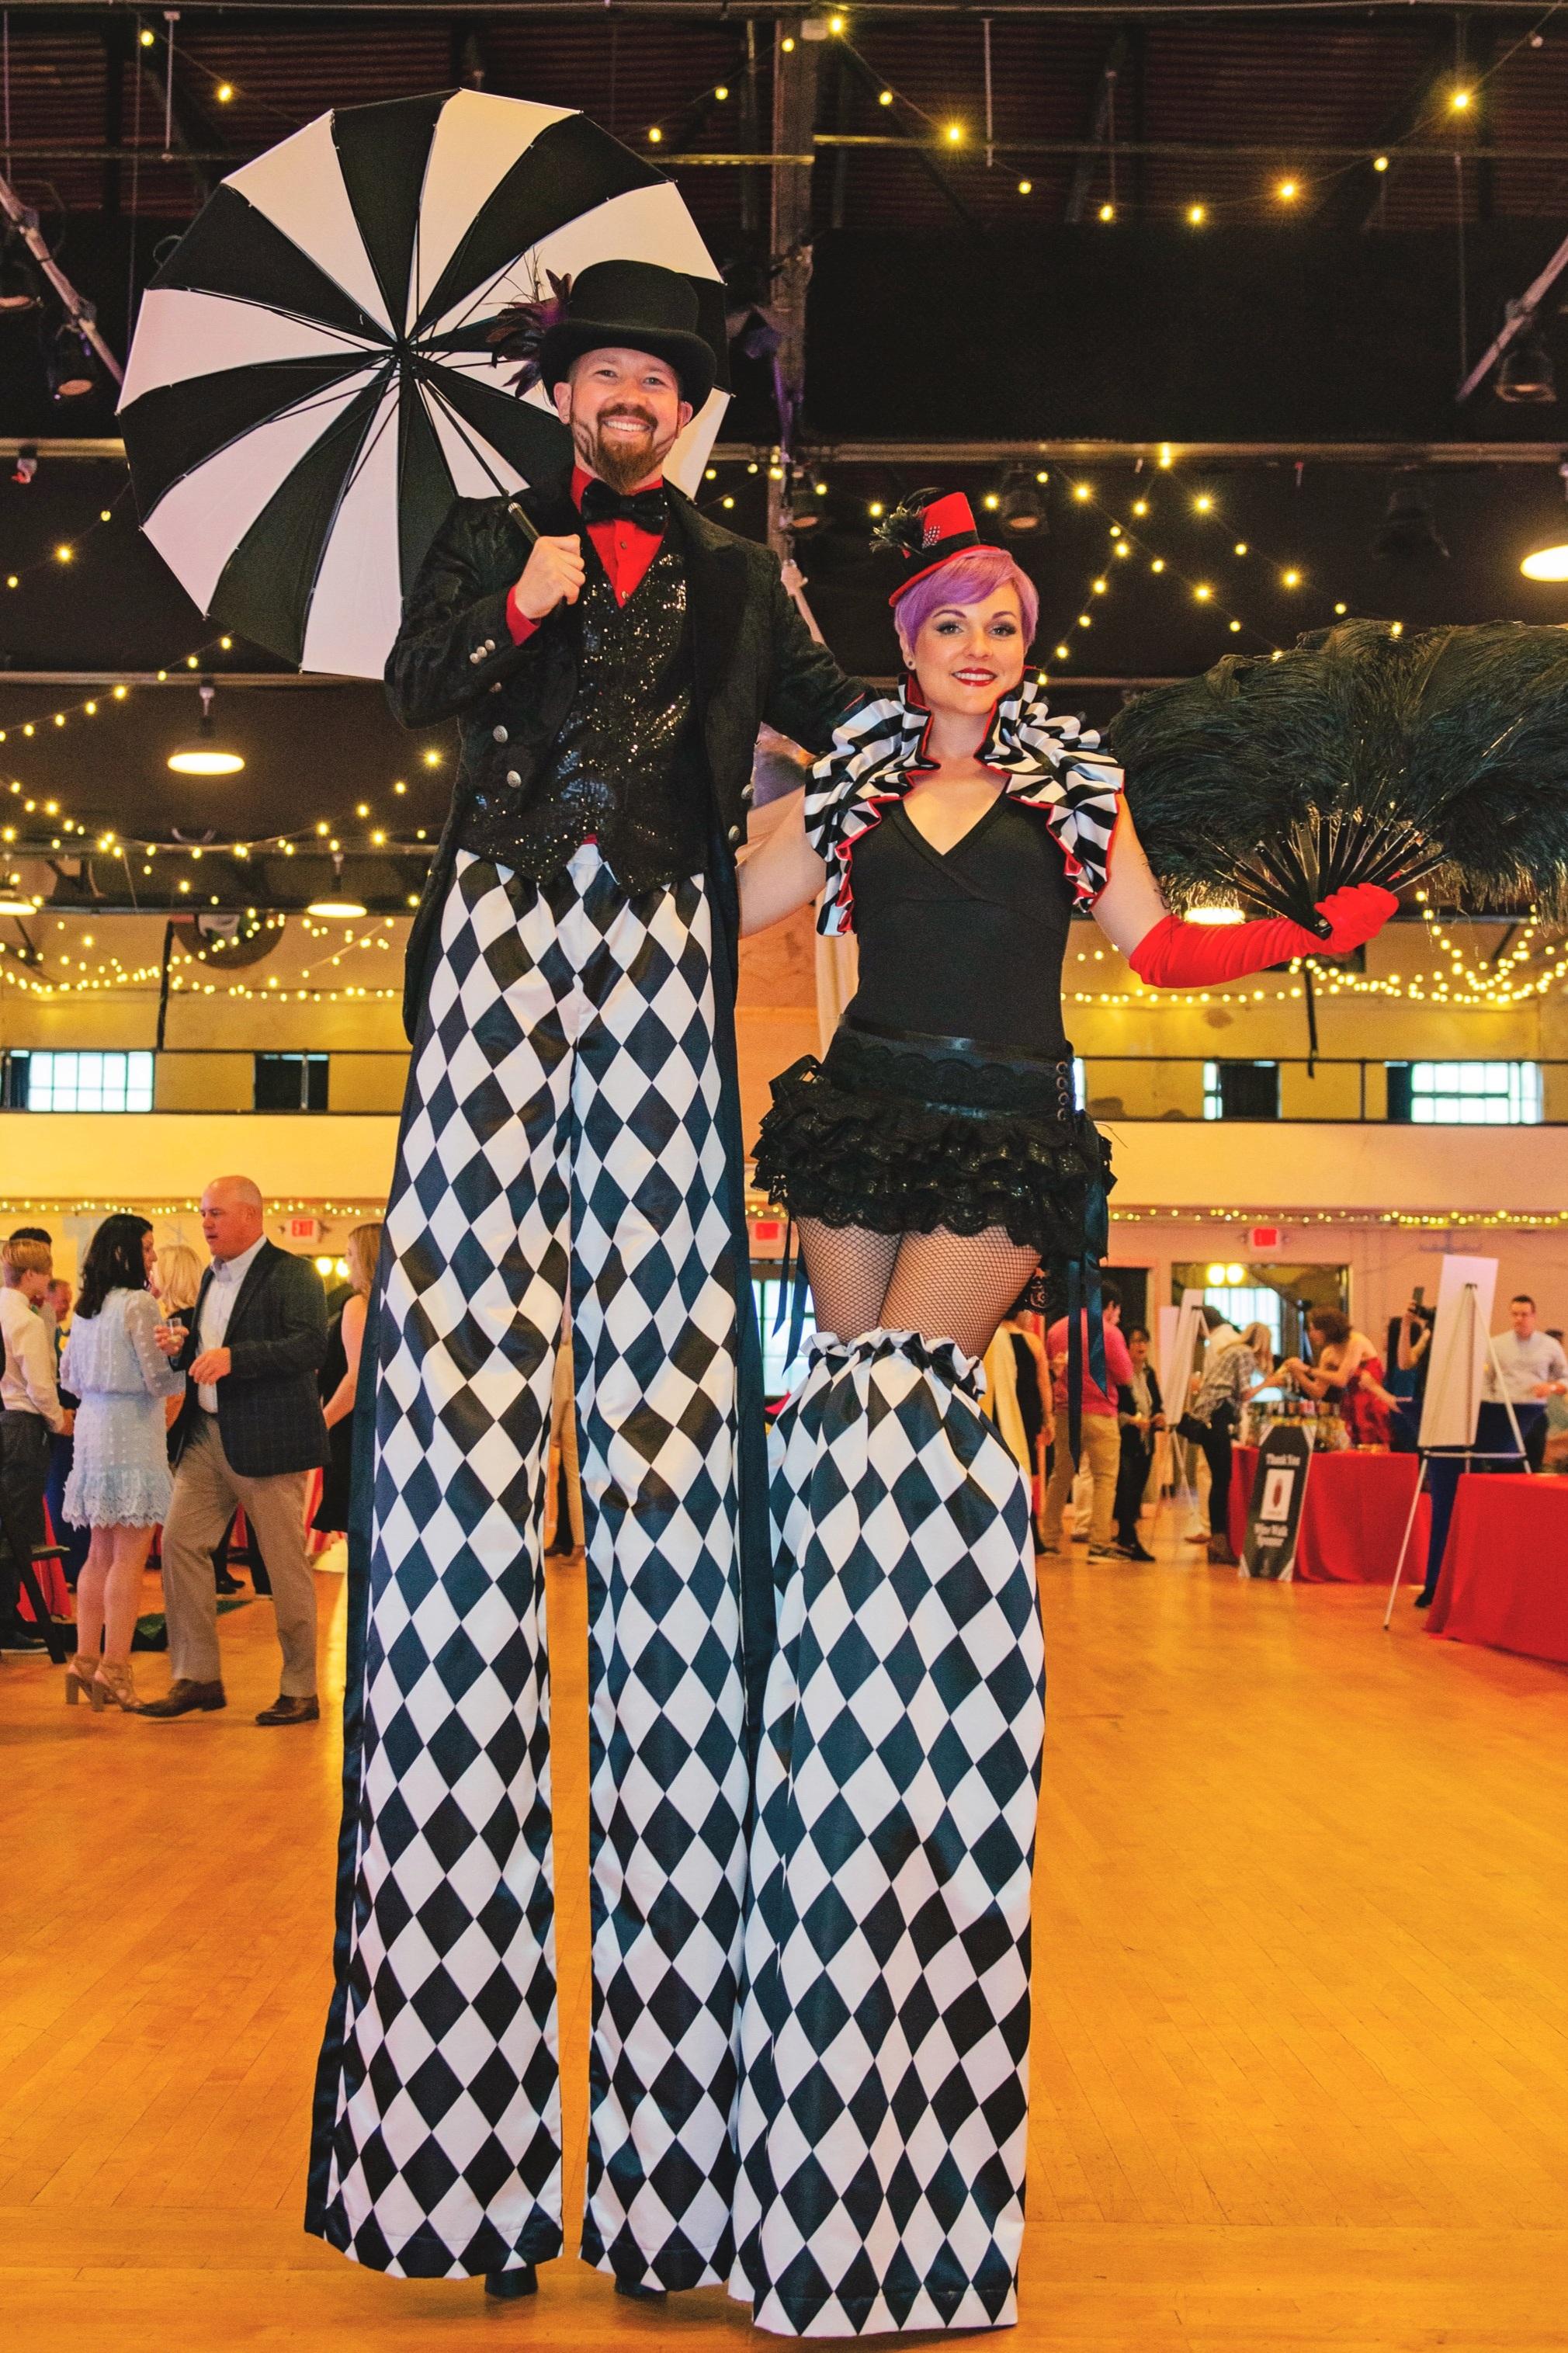 Circus Stilt-walkers